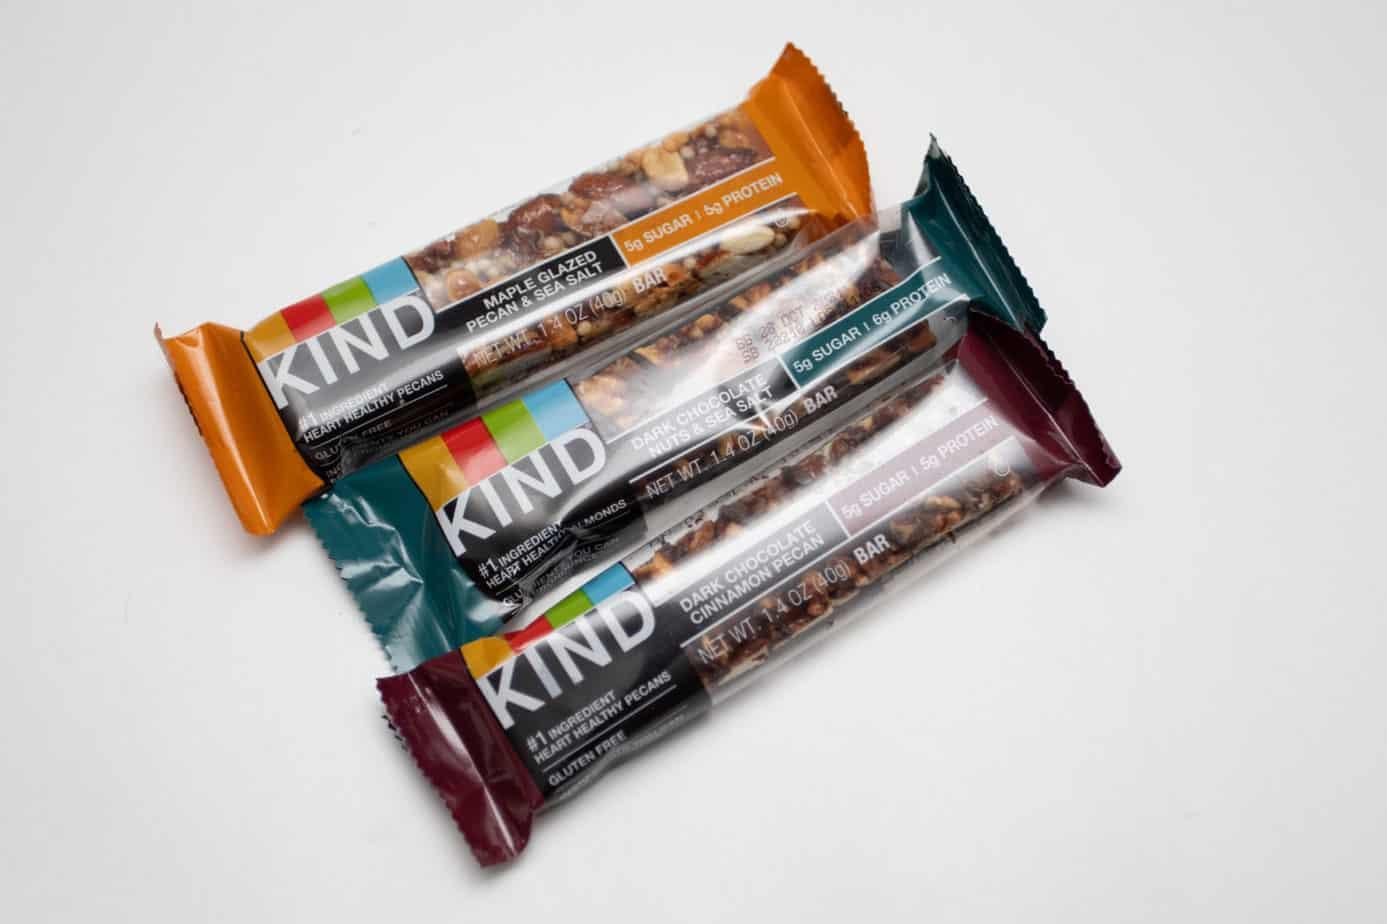 are Kind bars vegan?